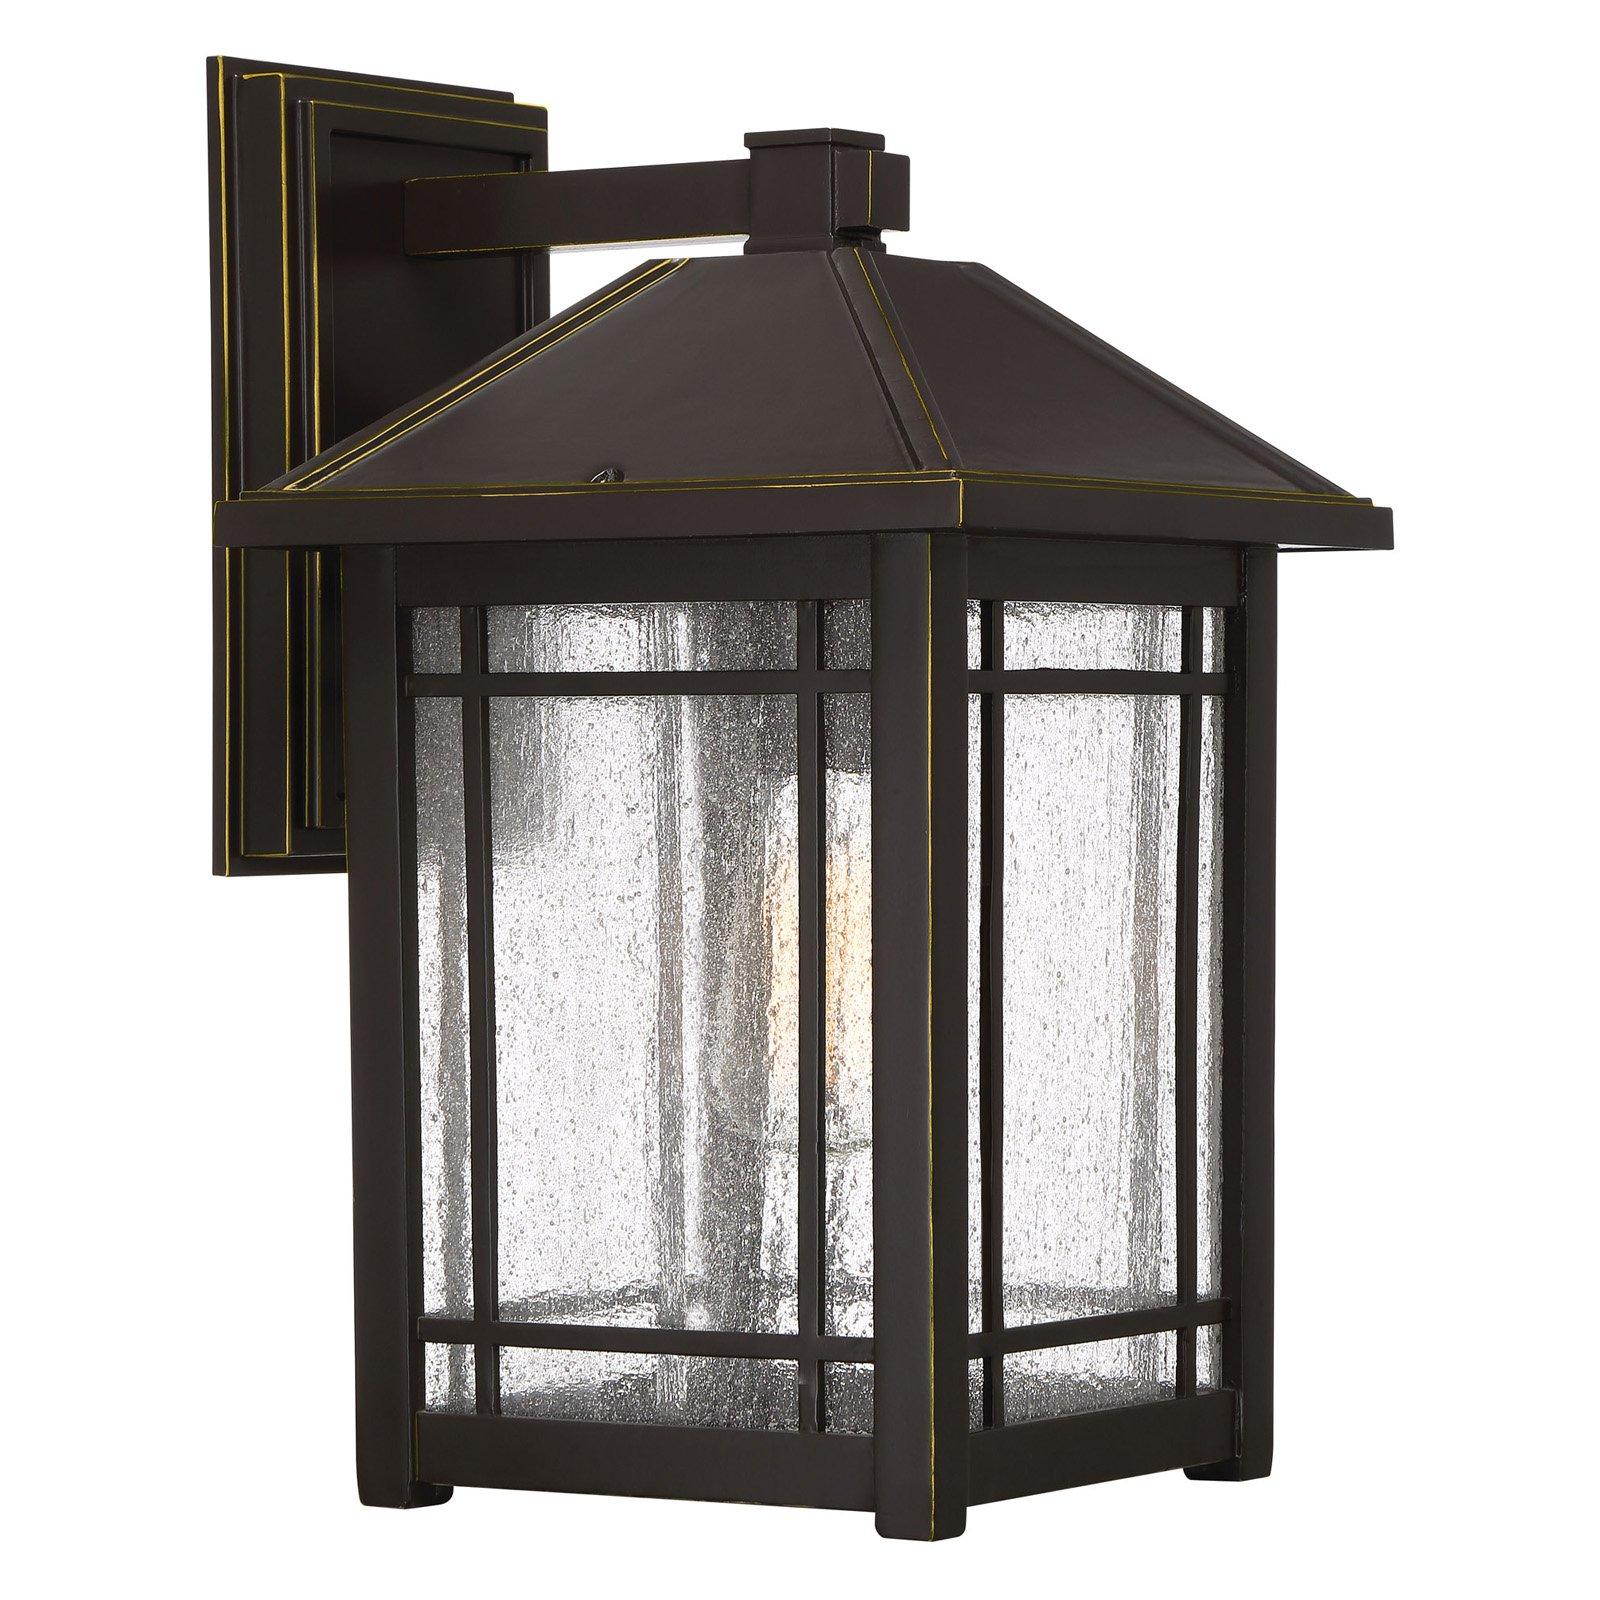 Quoizel Cedar Point CPT84 Outdoor Wall Lantern